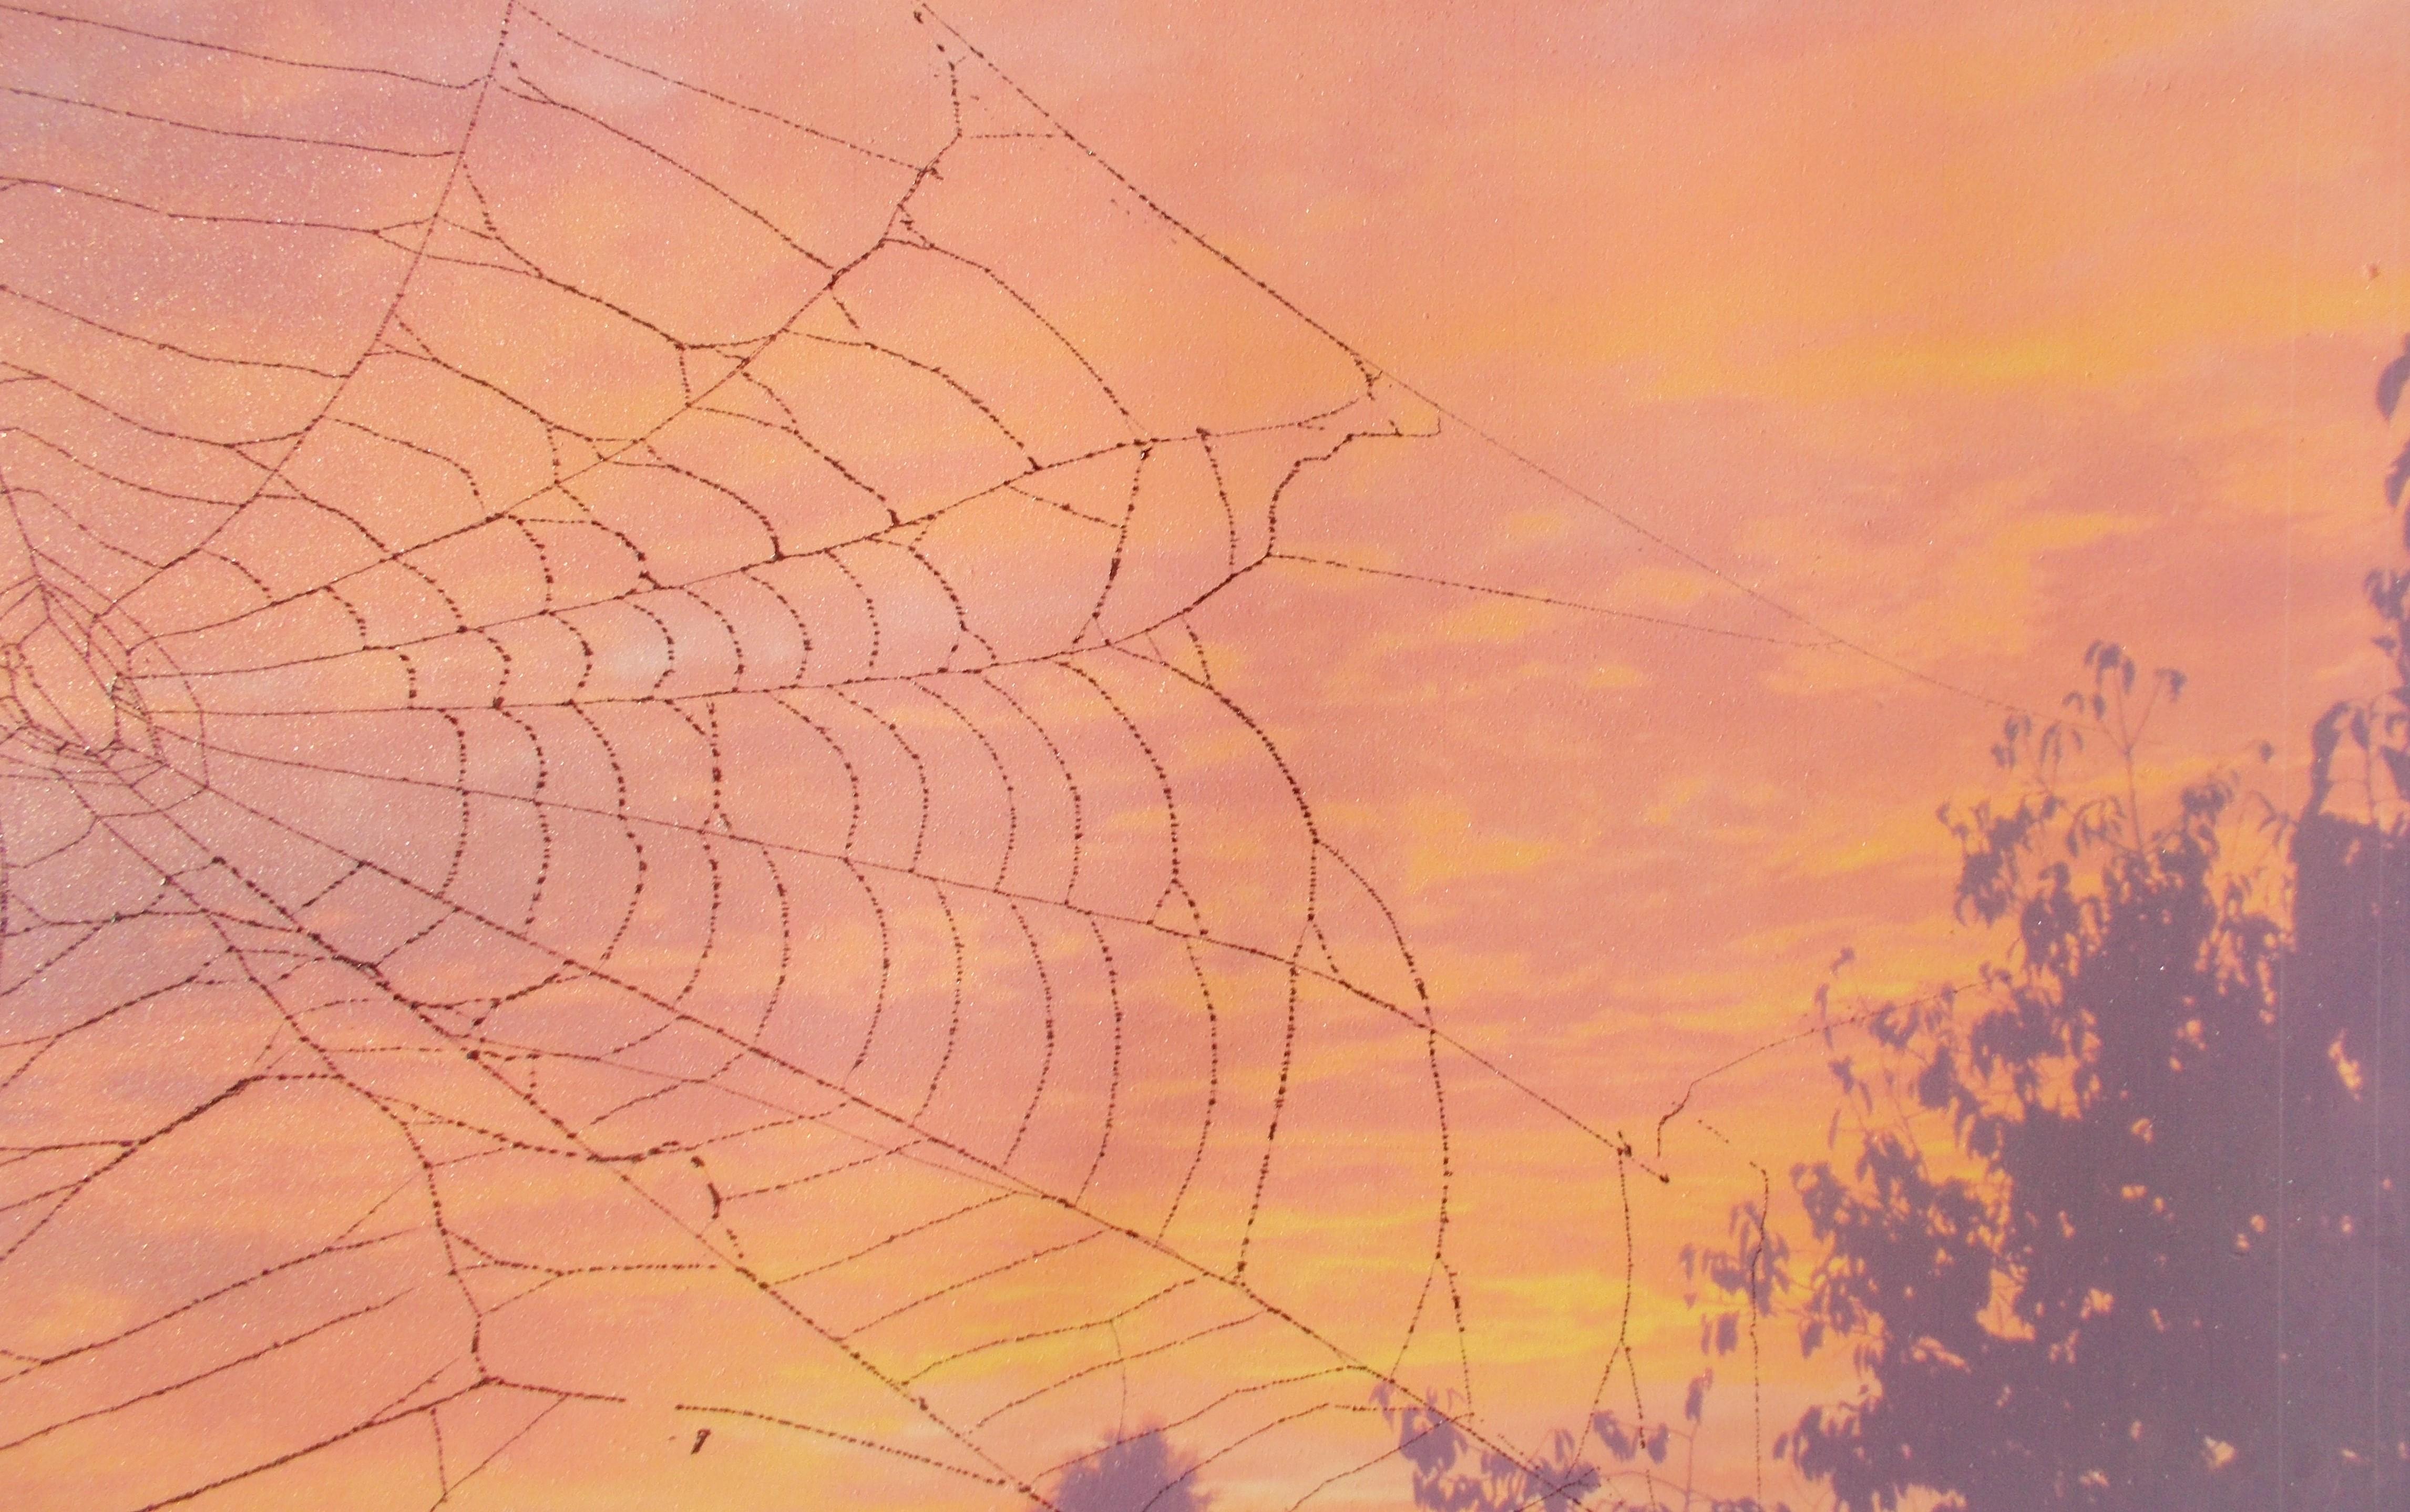 Sonnenuntergang 2 (Foto mit echtem Netz) 30*40